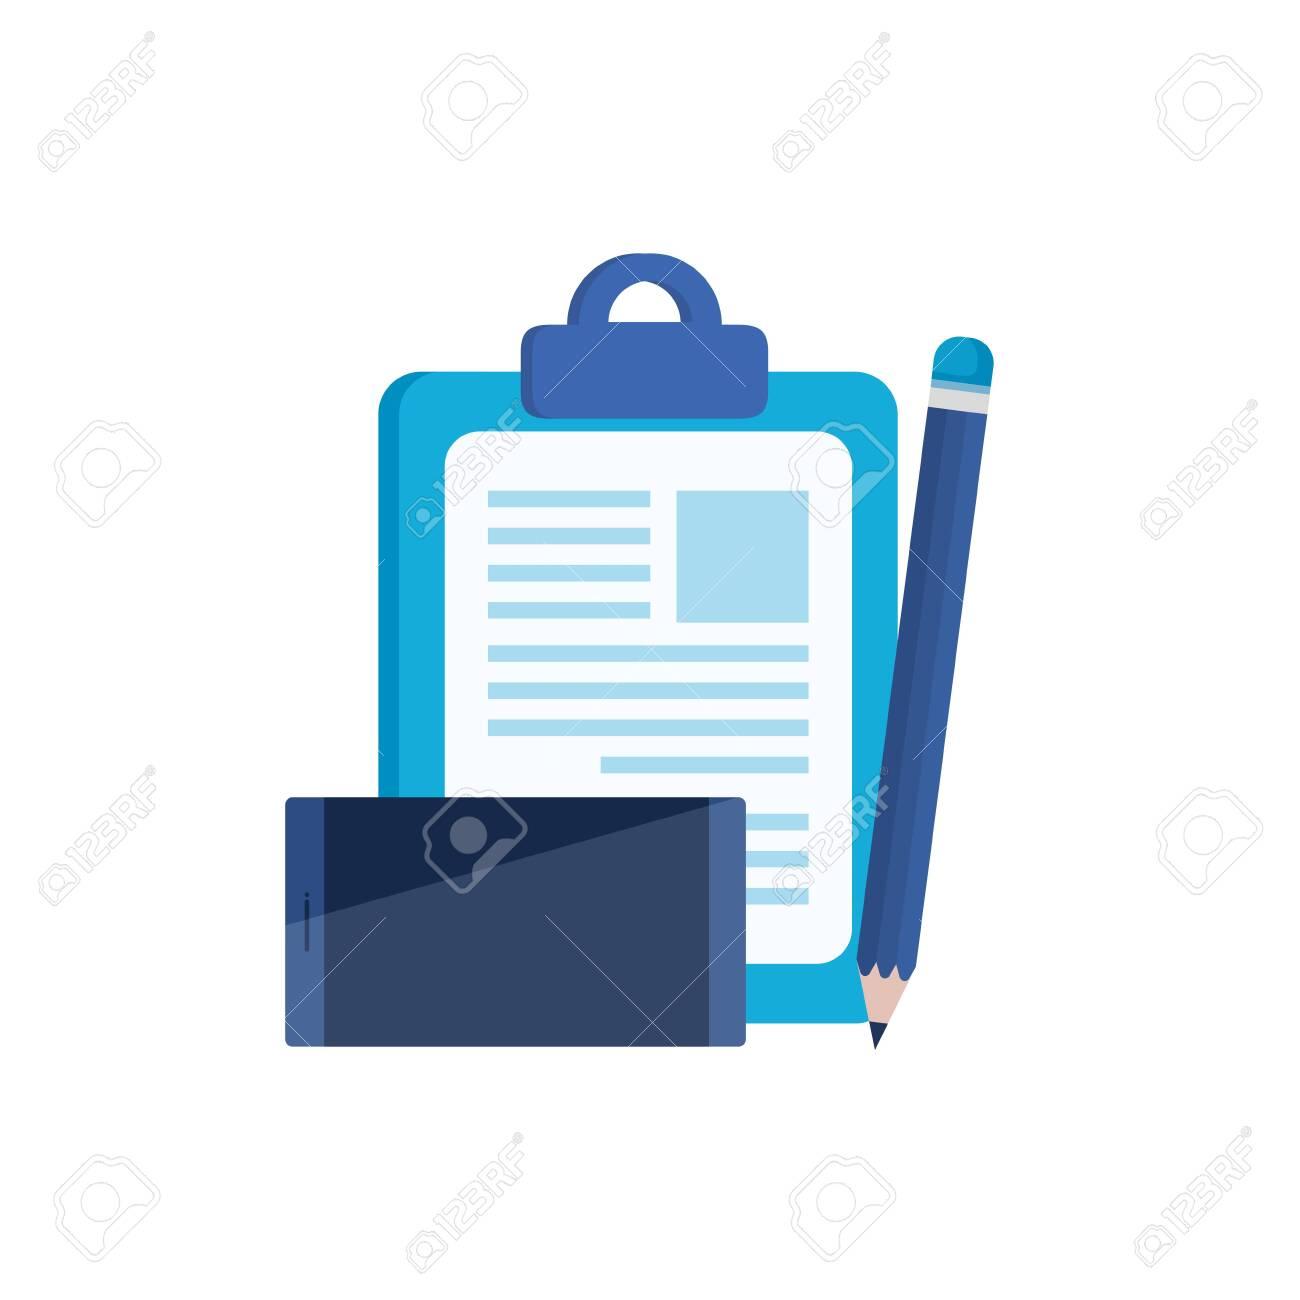 checklist clipboard with smartphone device vector illustration design - 129830894